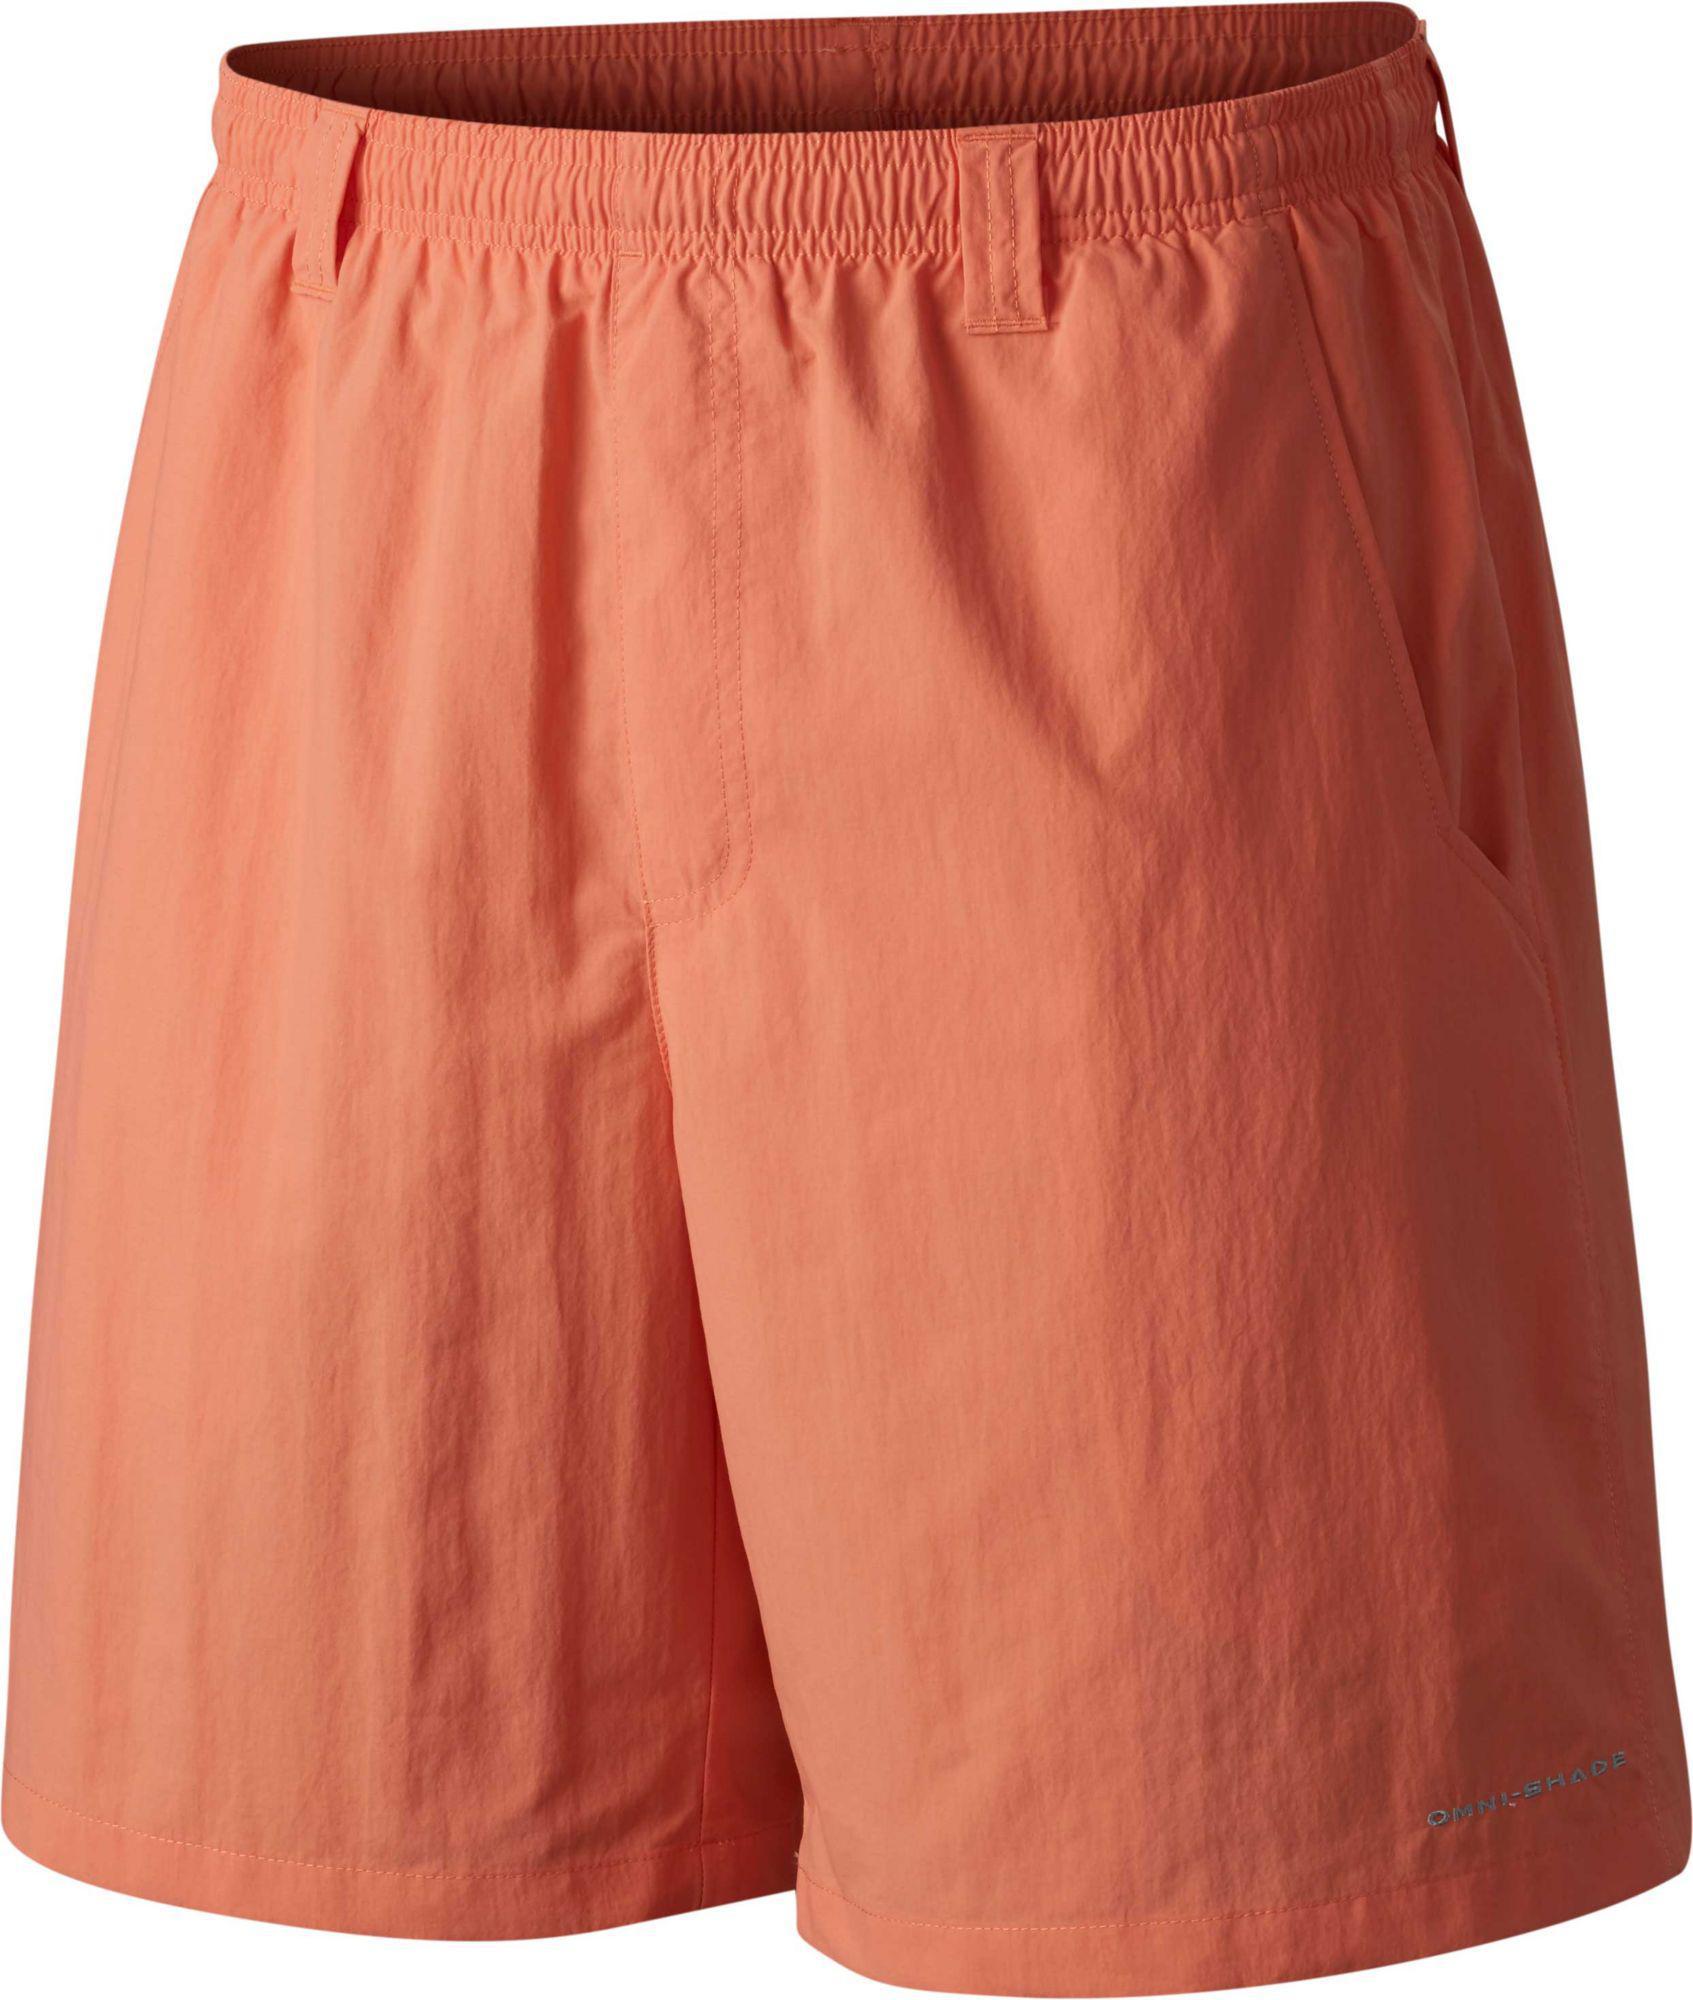 4fe106aa17 Columbia Pfg Backcast Iii Water Trunks in Orange for Men - Lyst